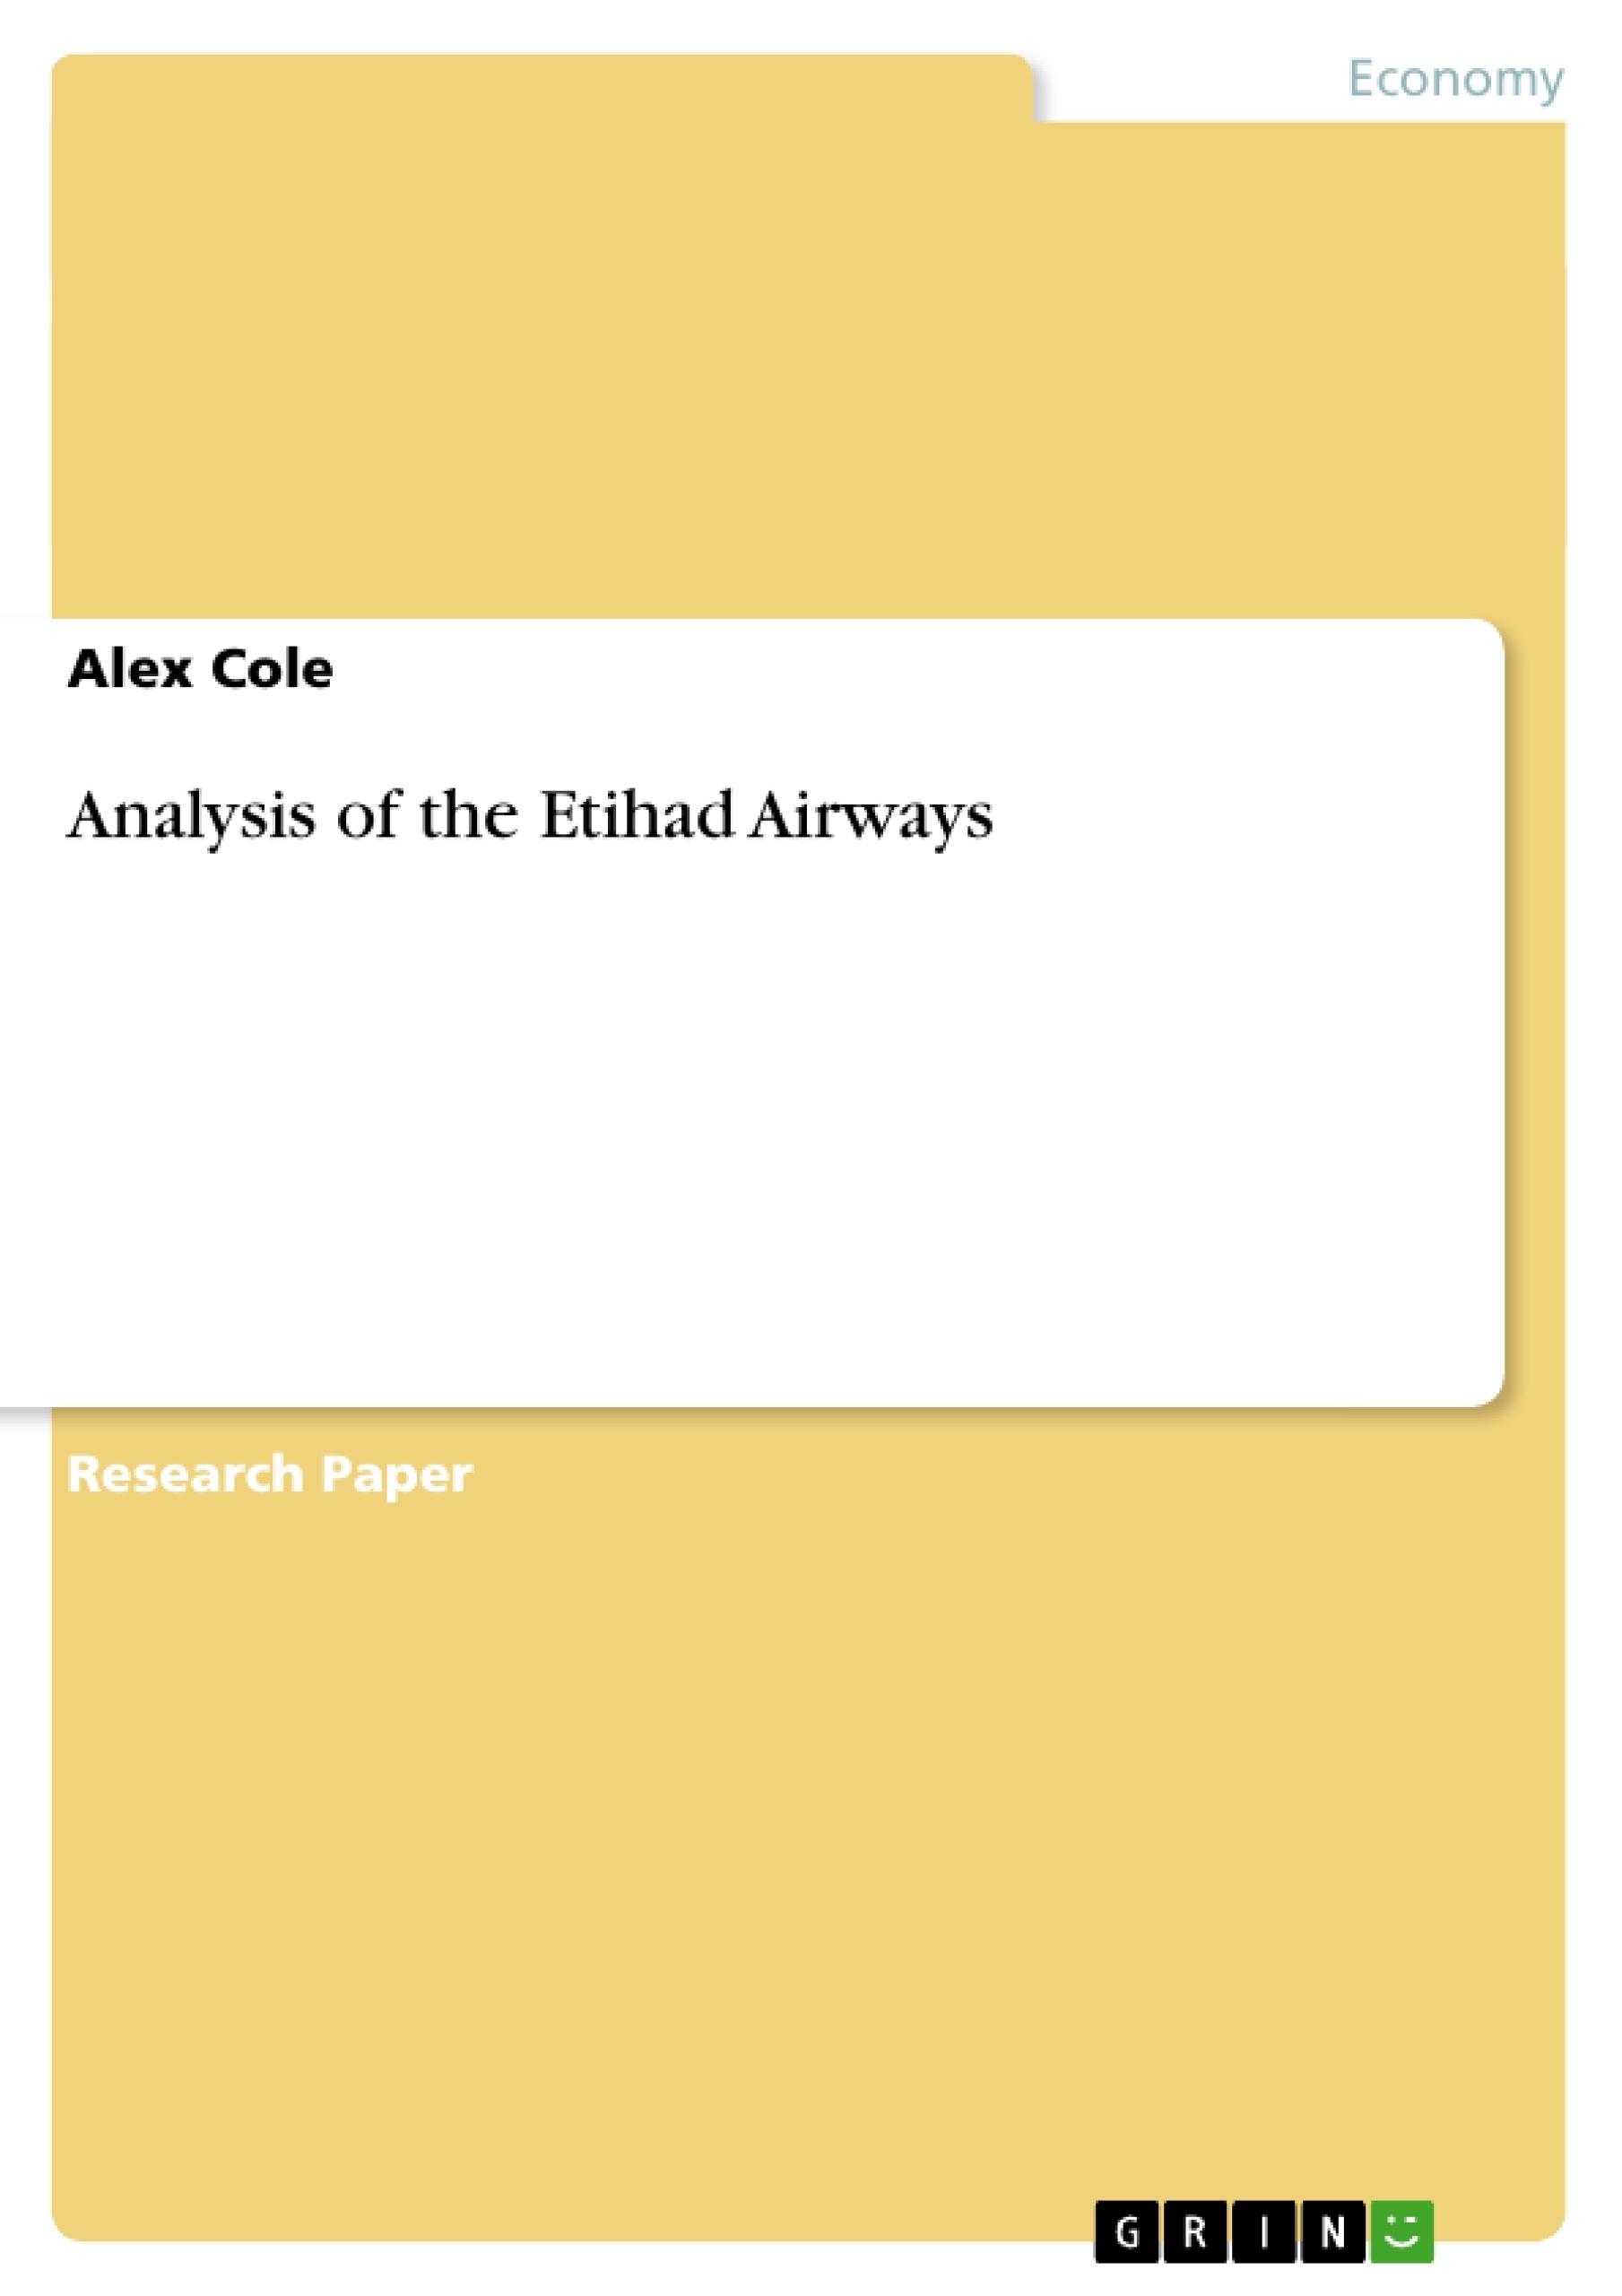 Title: Analysis of the Etihad Airways